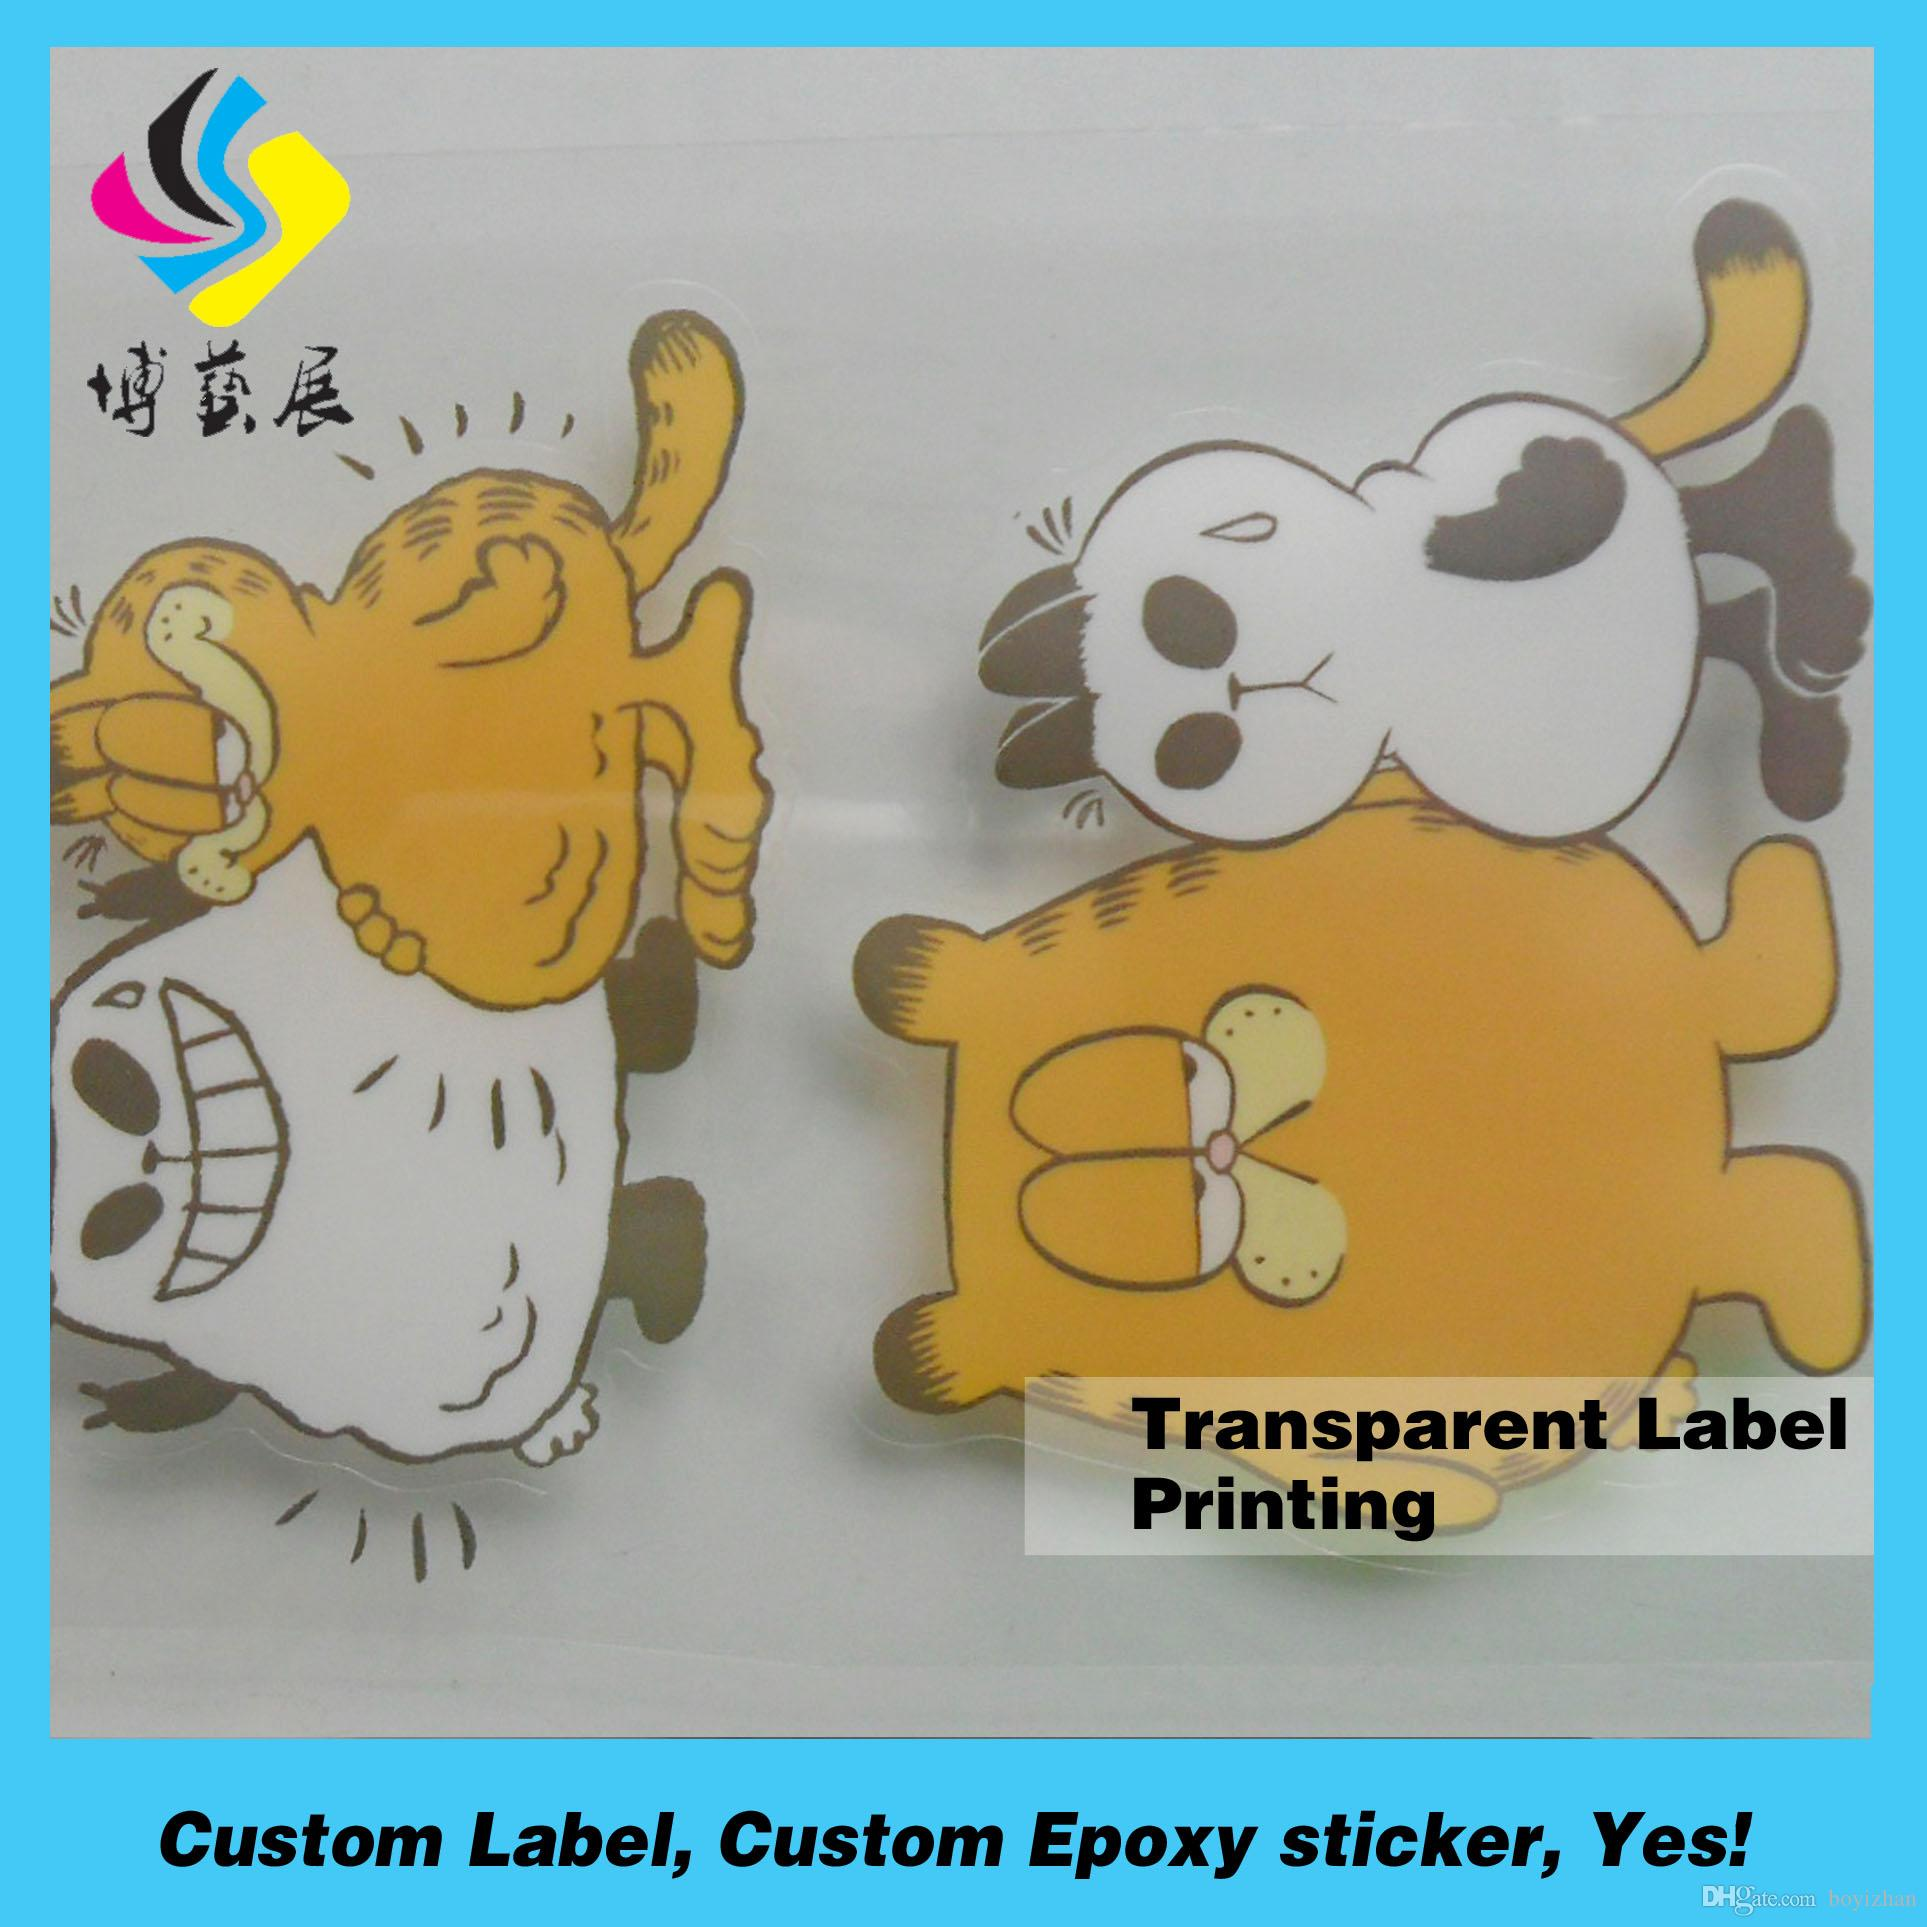 High quality printable personalized custom labels stickers gift stickers custom labels custom labels stickers gift stickers online with 0 12 piece on